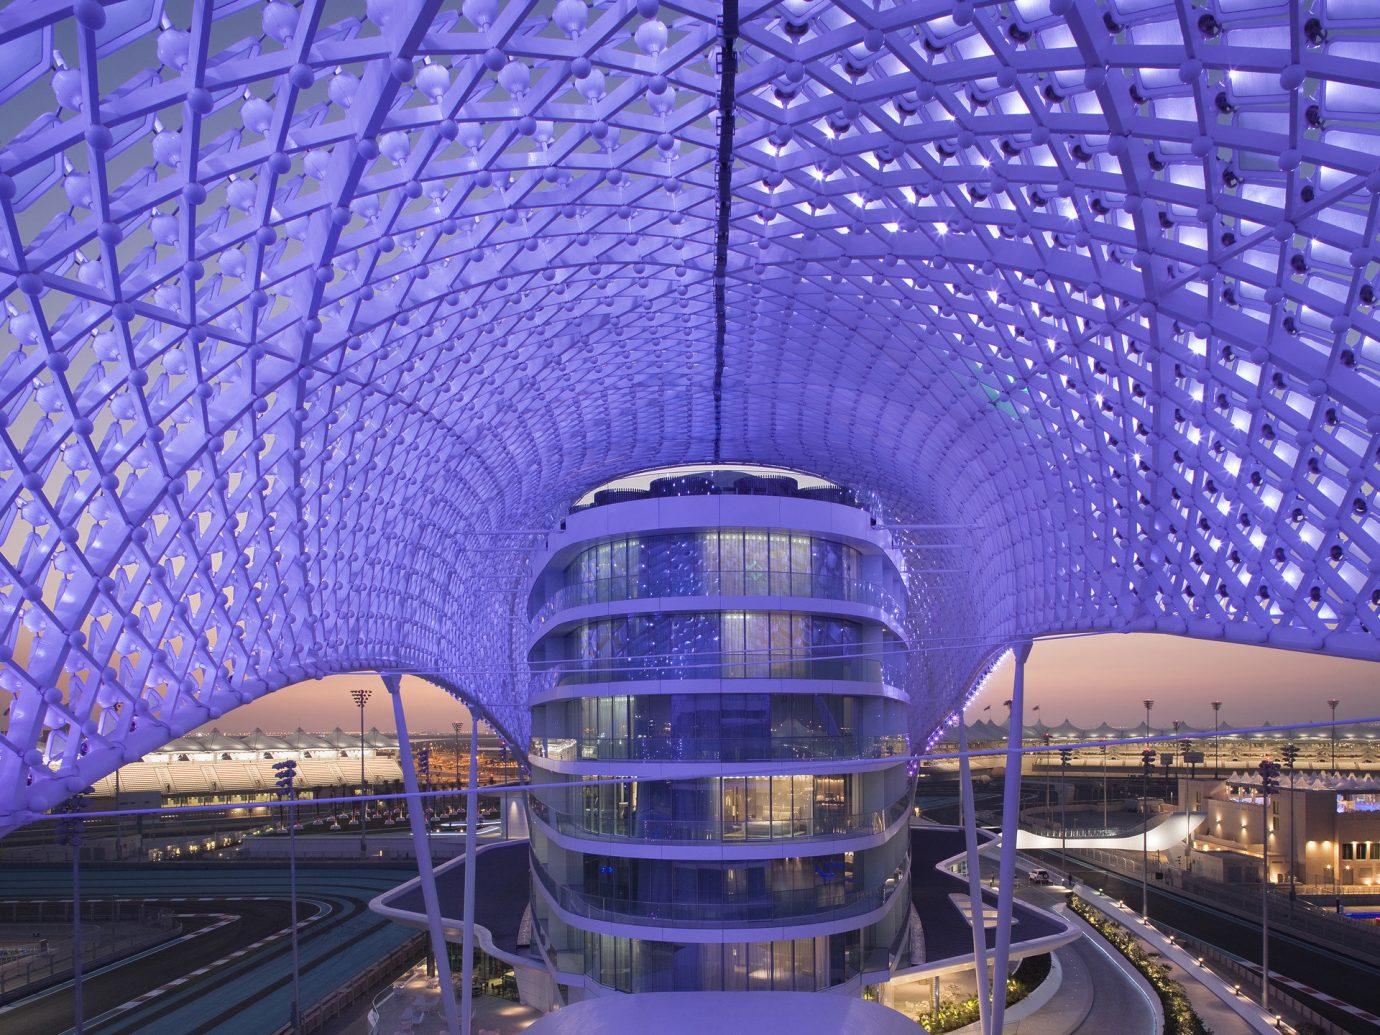 Hotels landmark Architecture skyscraper ceiling station reflection tourist attraction symmetry convention center stadium public transport cityscape subway